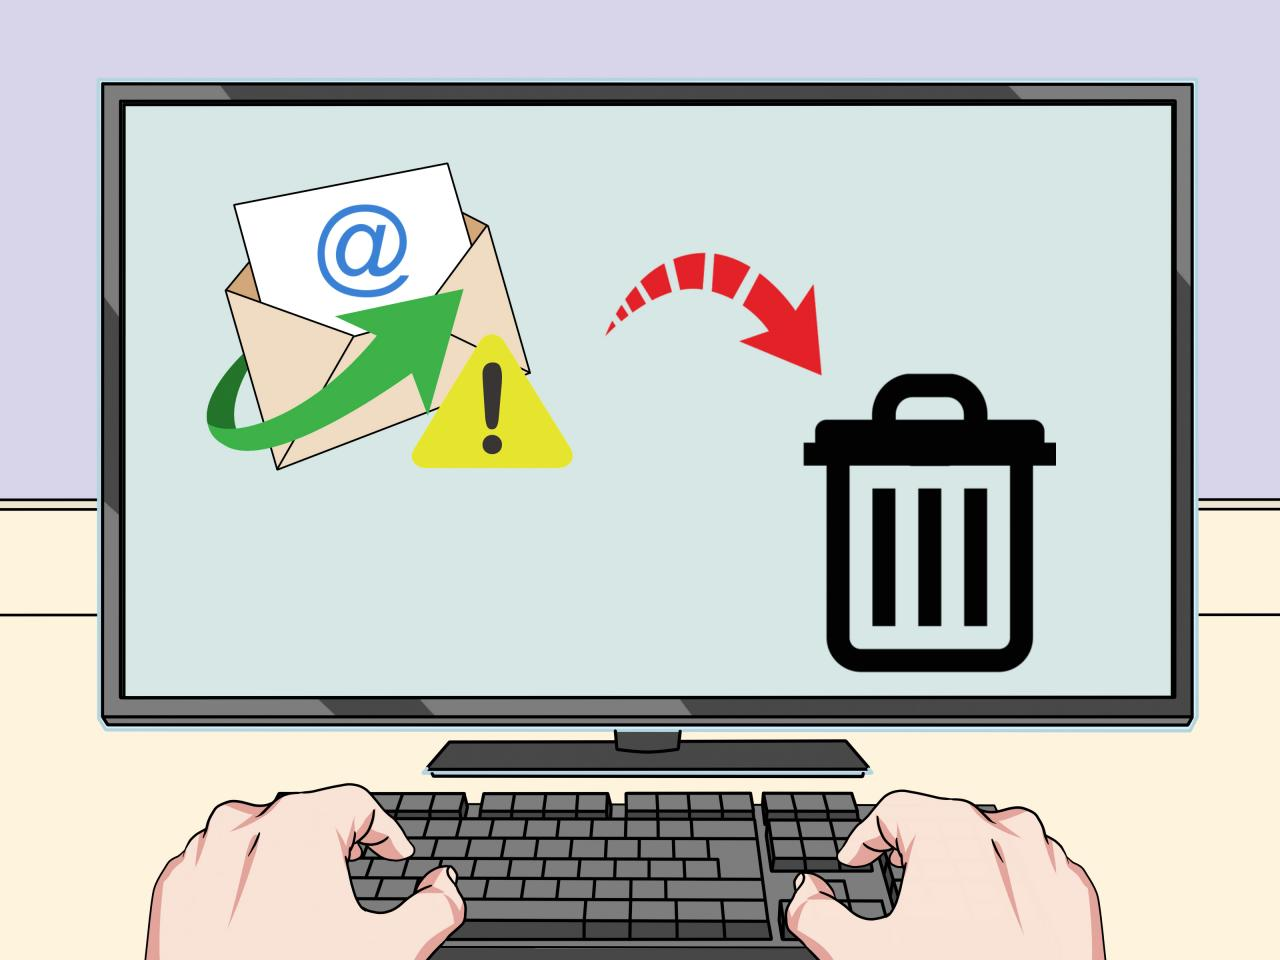 3 Ways to Prevent Phishing - wikiHow